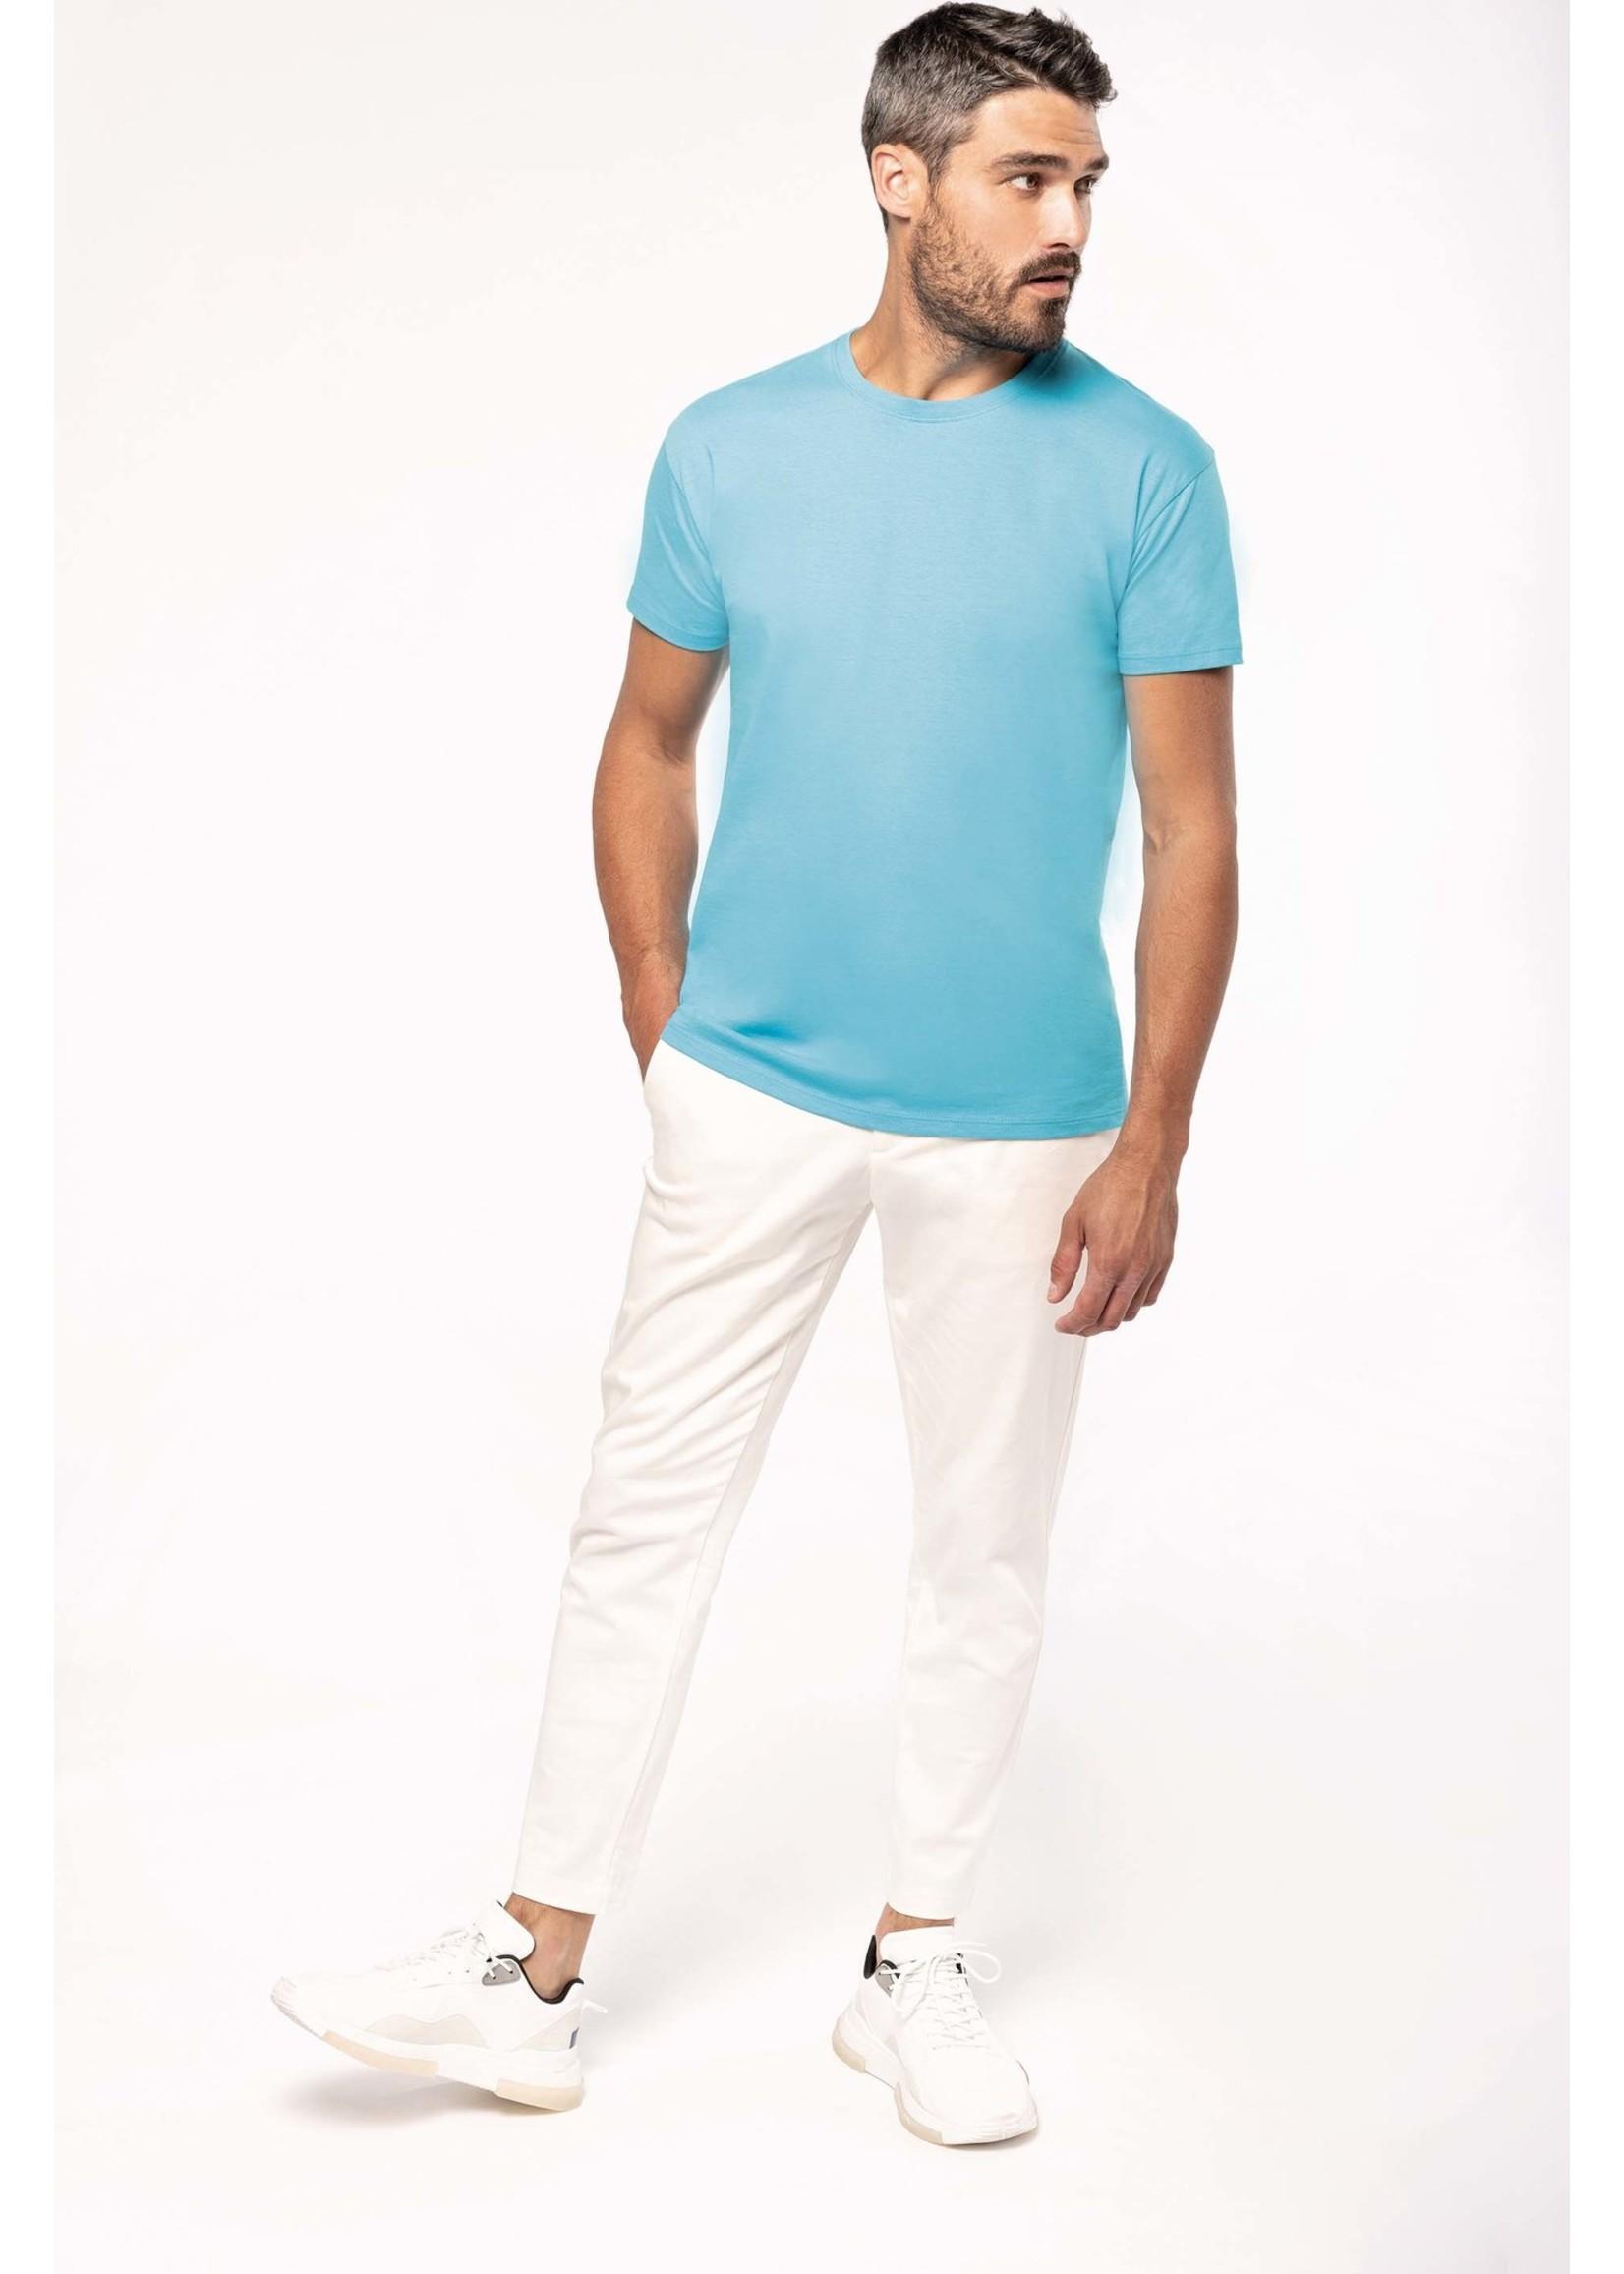 Eco-Friendly Unisex T-shirt -Kelly Green